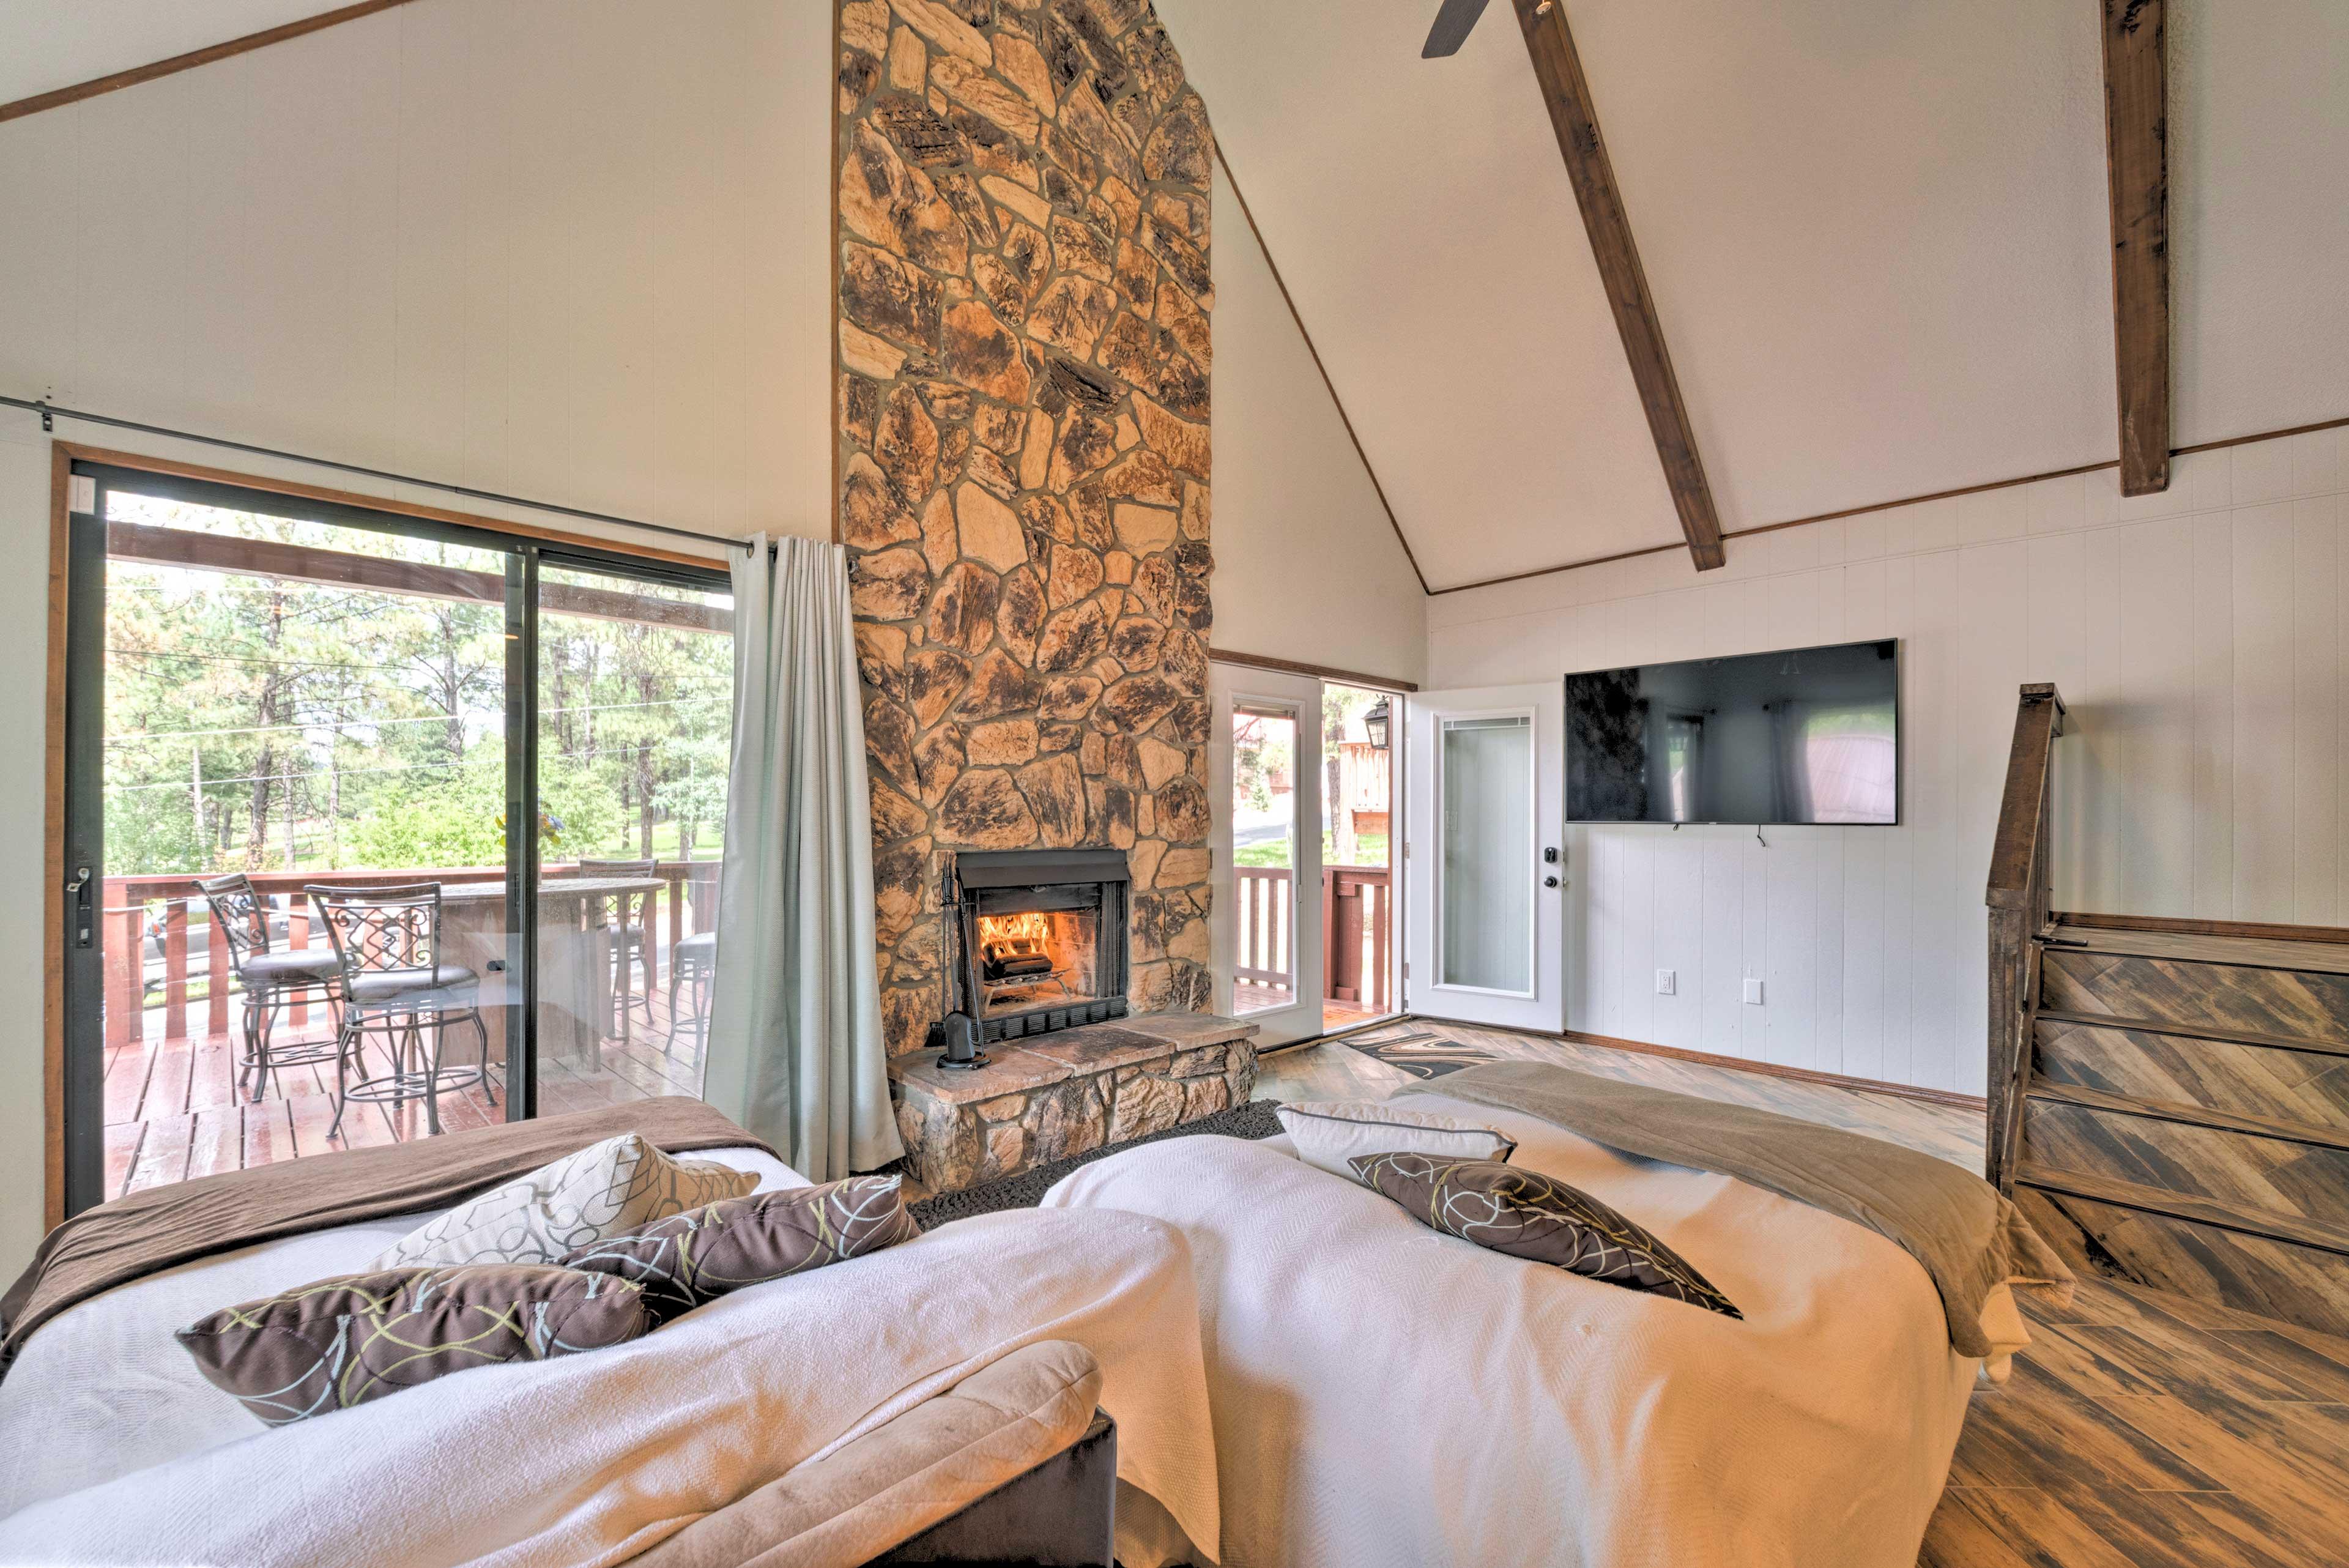 Living Room | 2 Sleeper Sofas